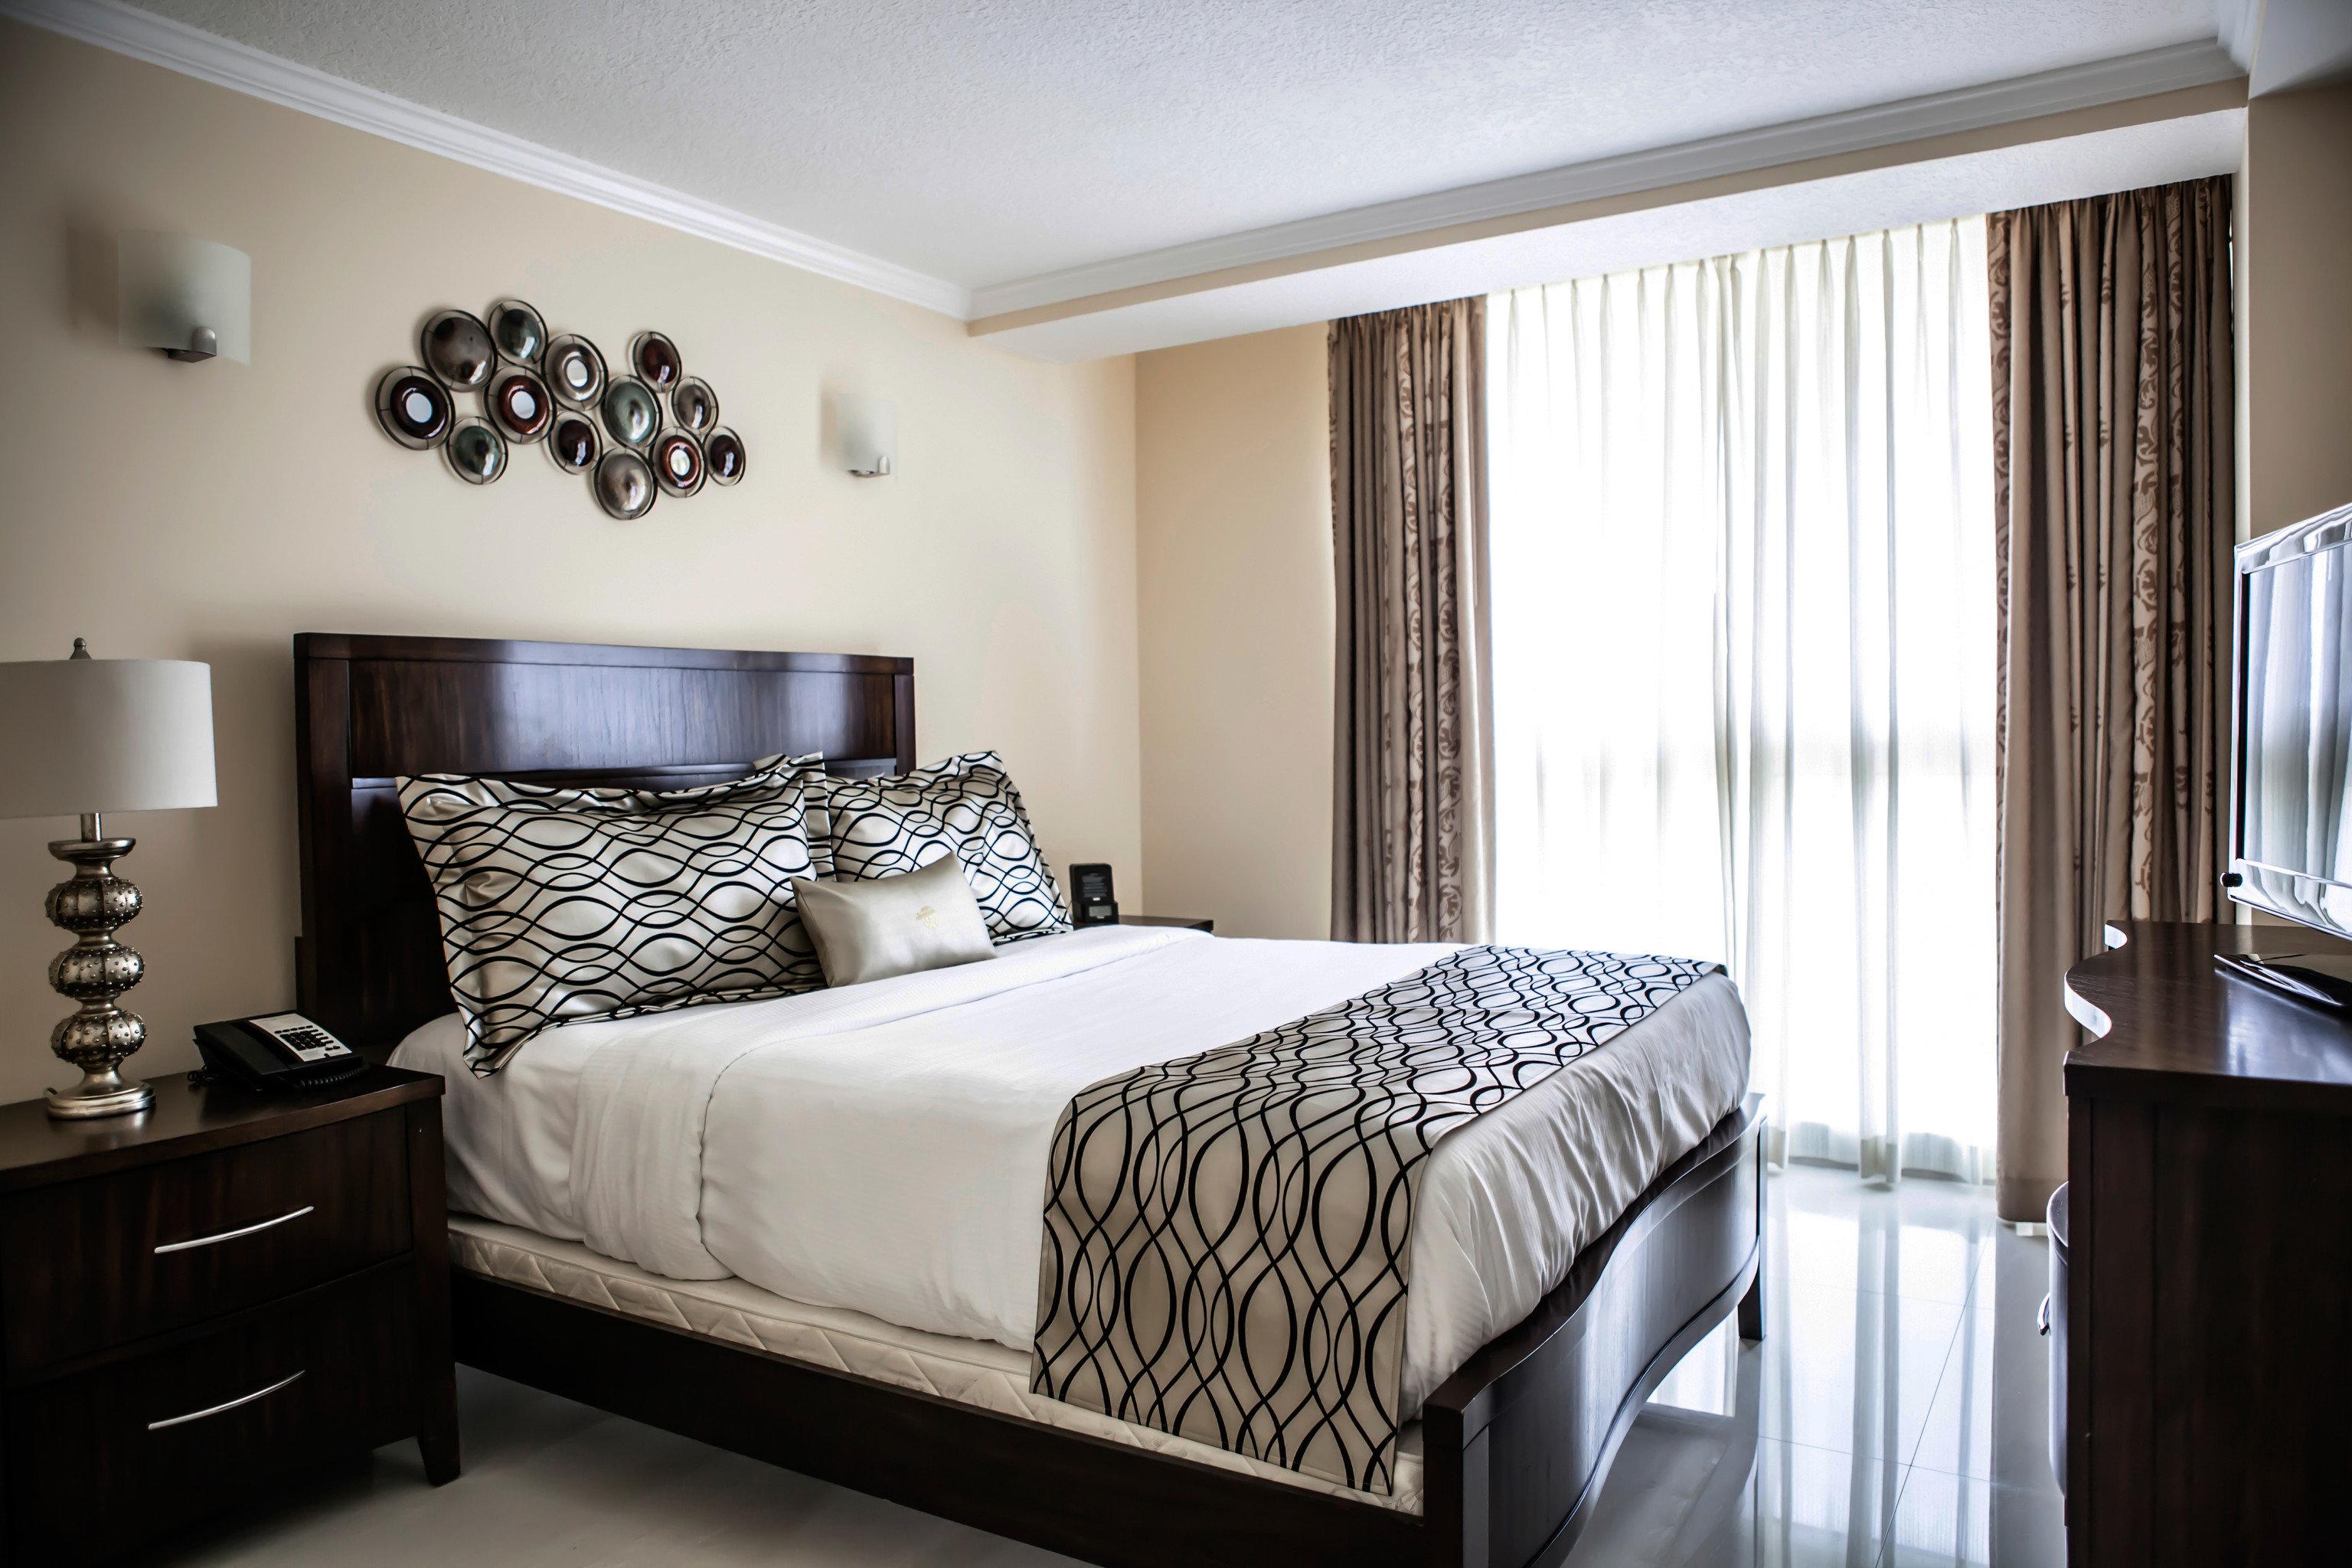 sofa Bedroom property Suite home cottage flat